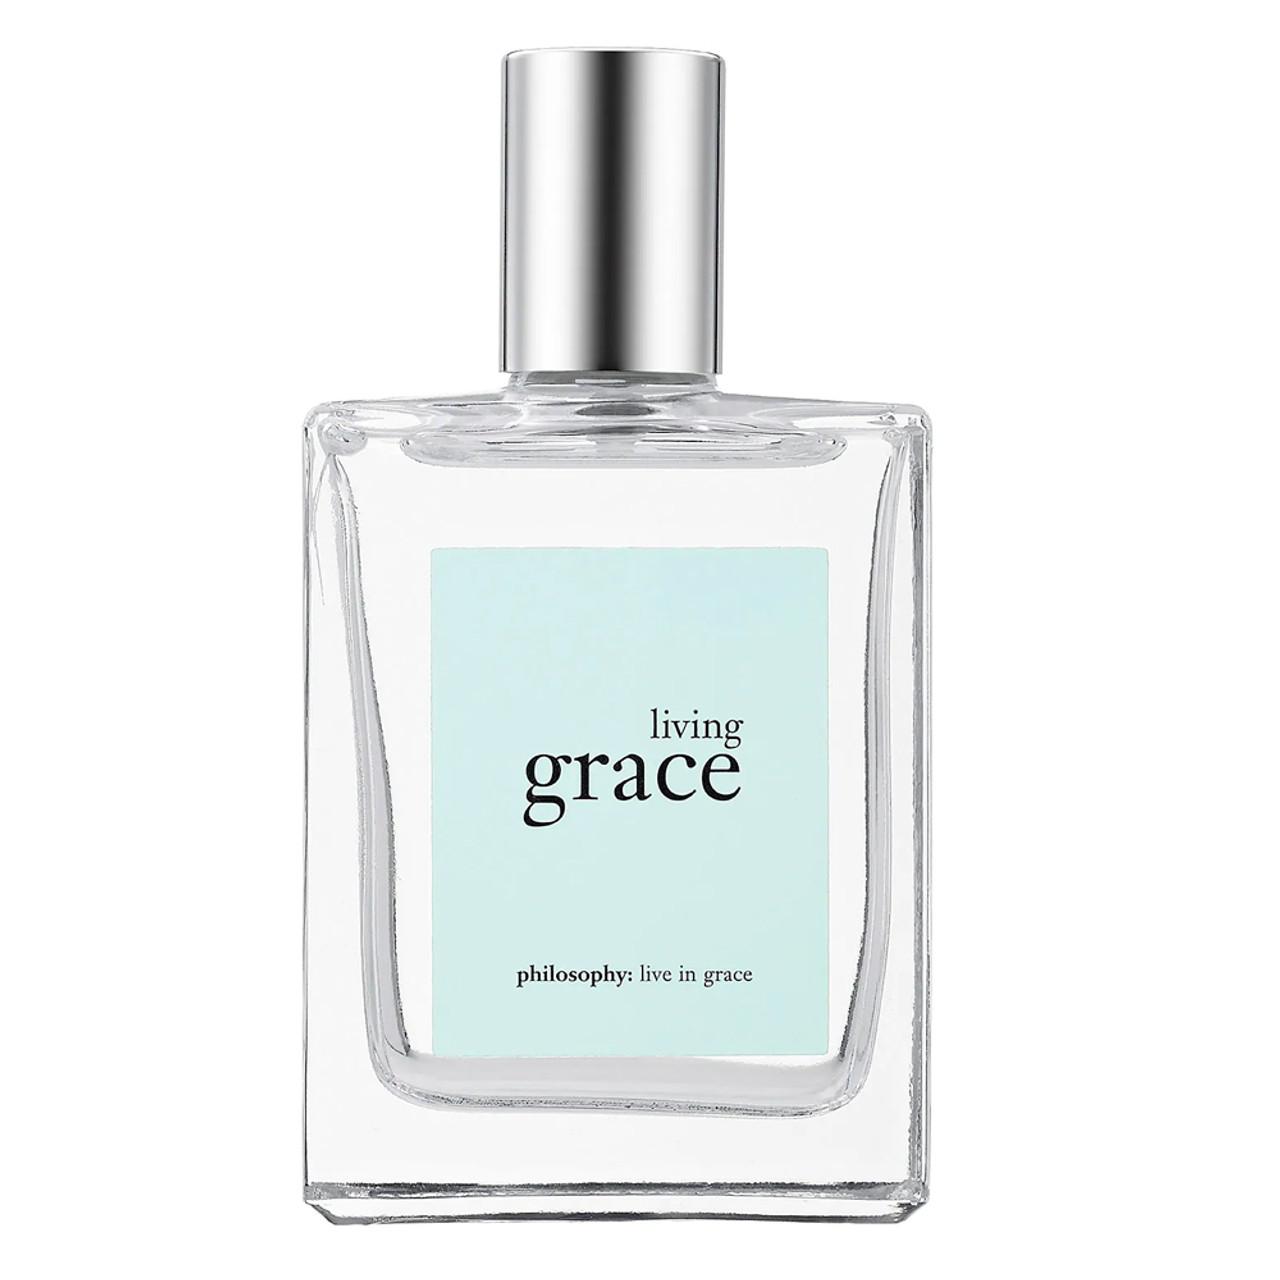 philosophy Living Grace Fragrance BeautifiedYou.com